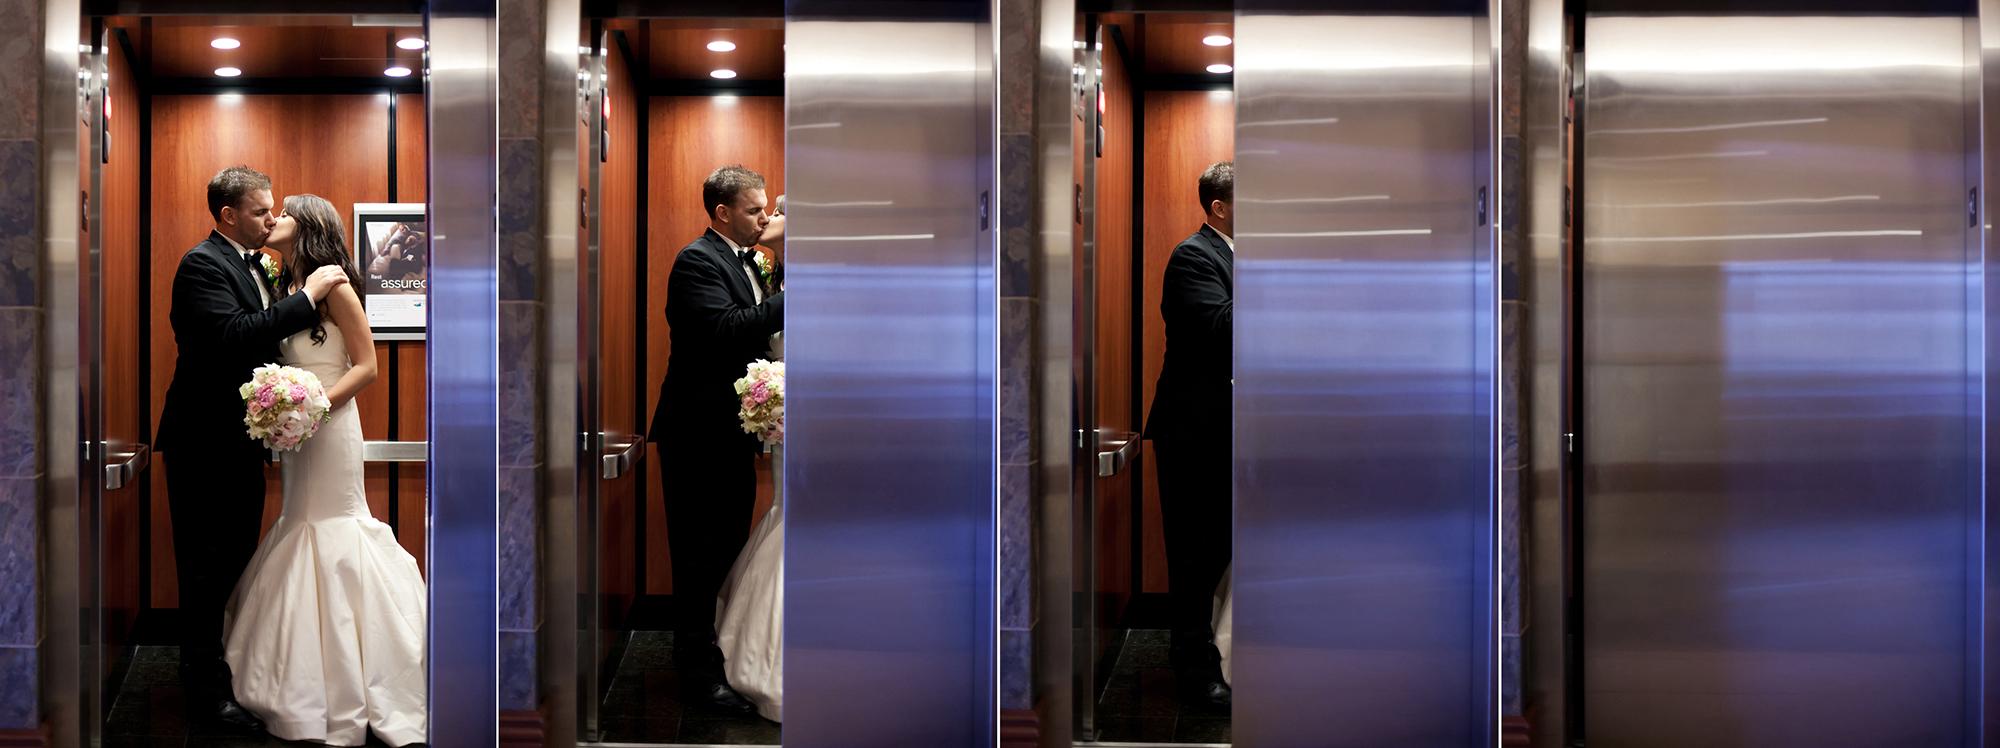 adam-szarmack-bride-groom-kiss-elevator.jpg